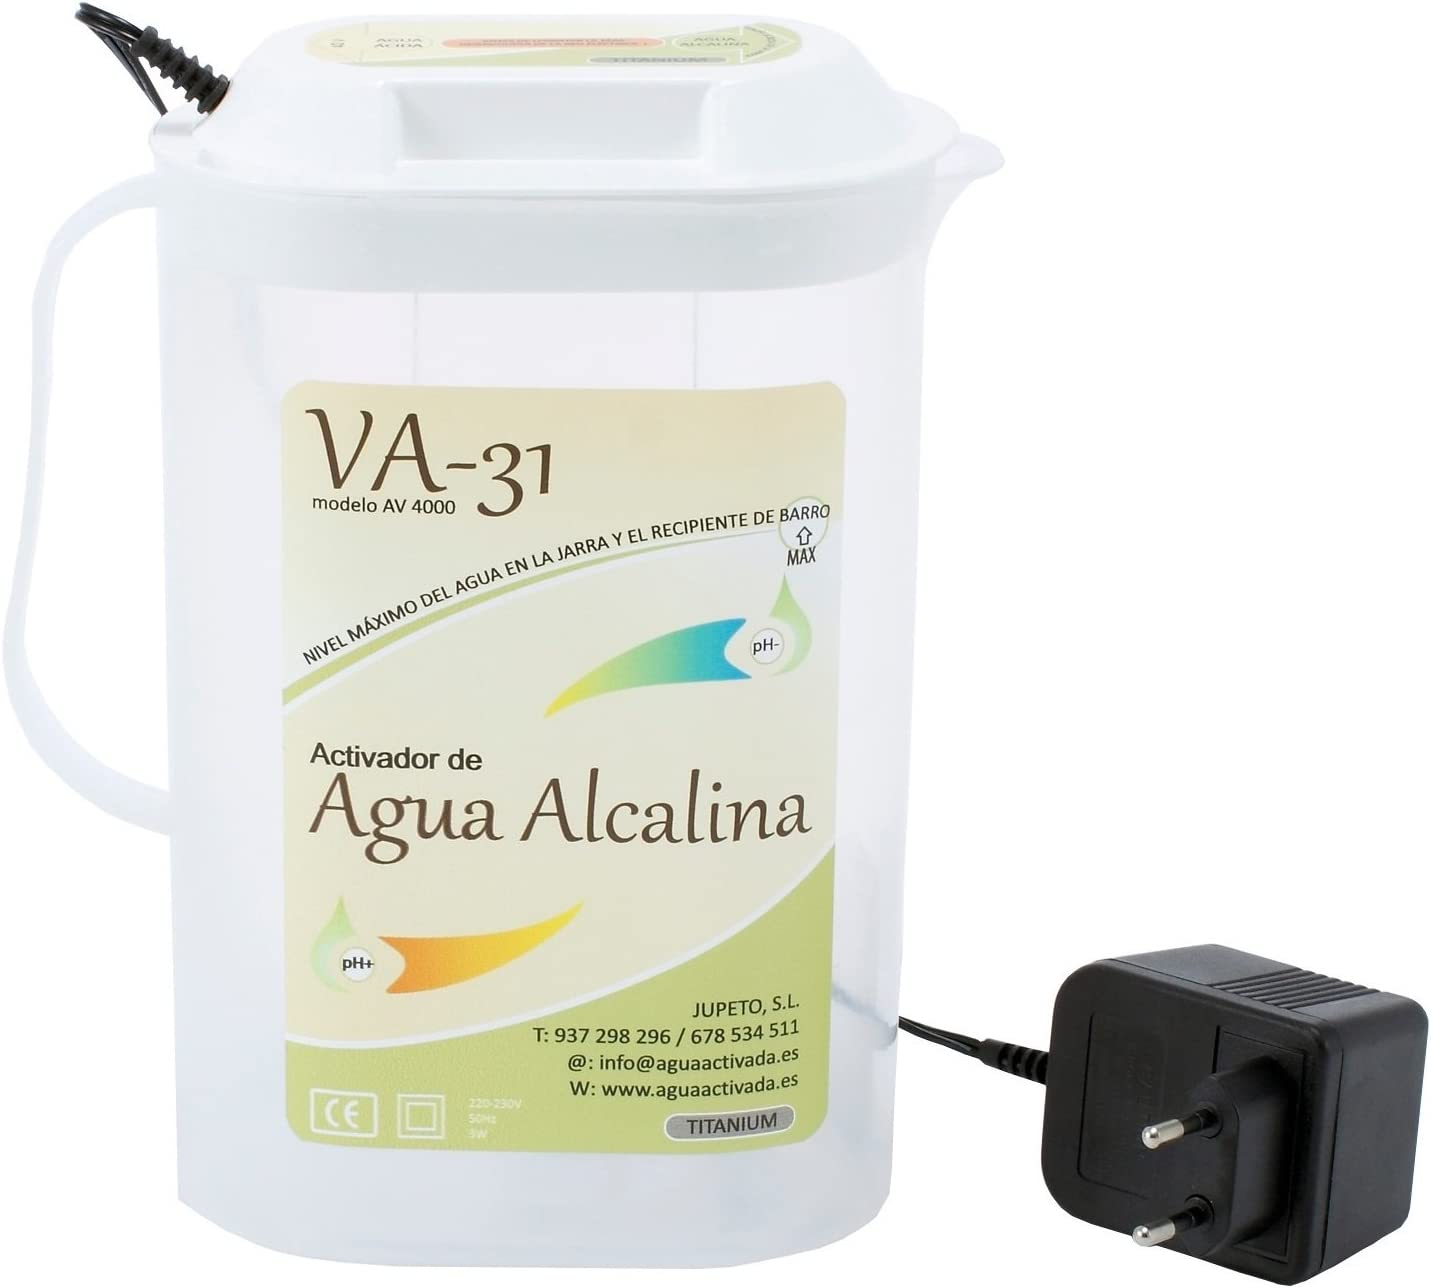 IONIZADOR DE AGUA ALCALINA: Amazon.es: Hogar